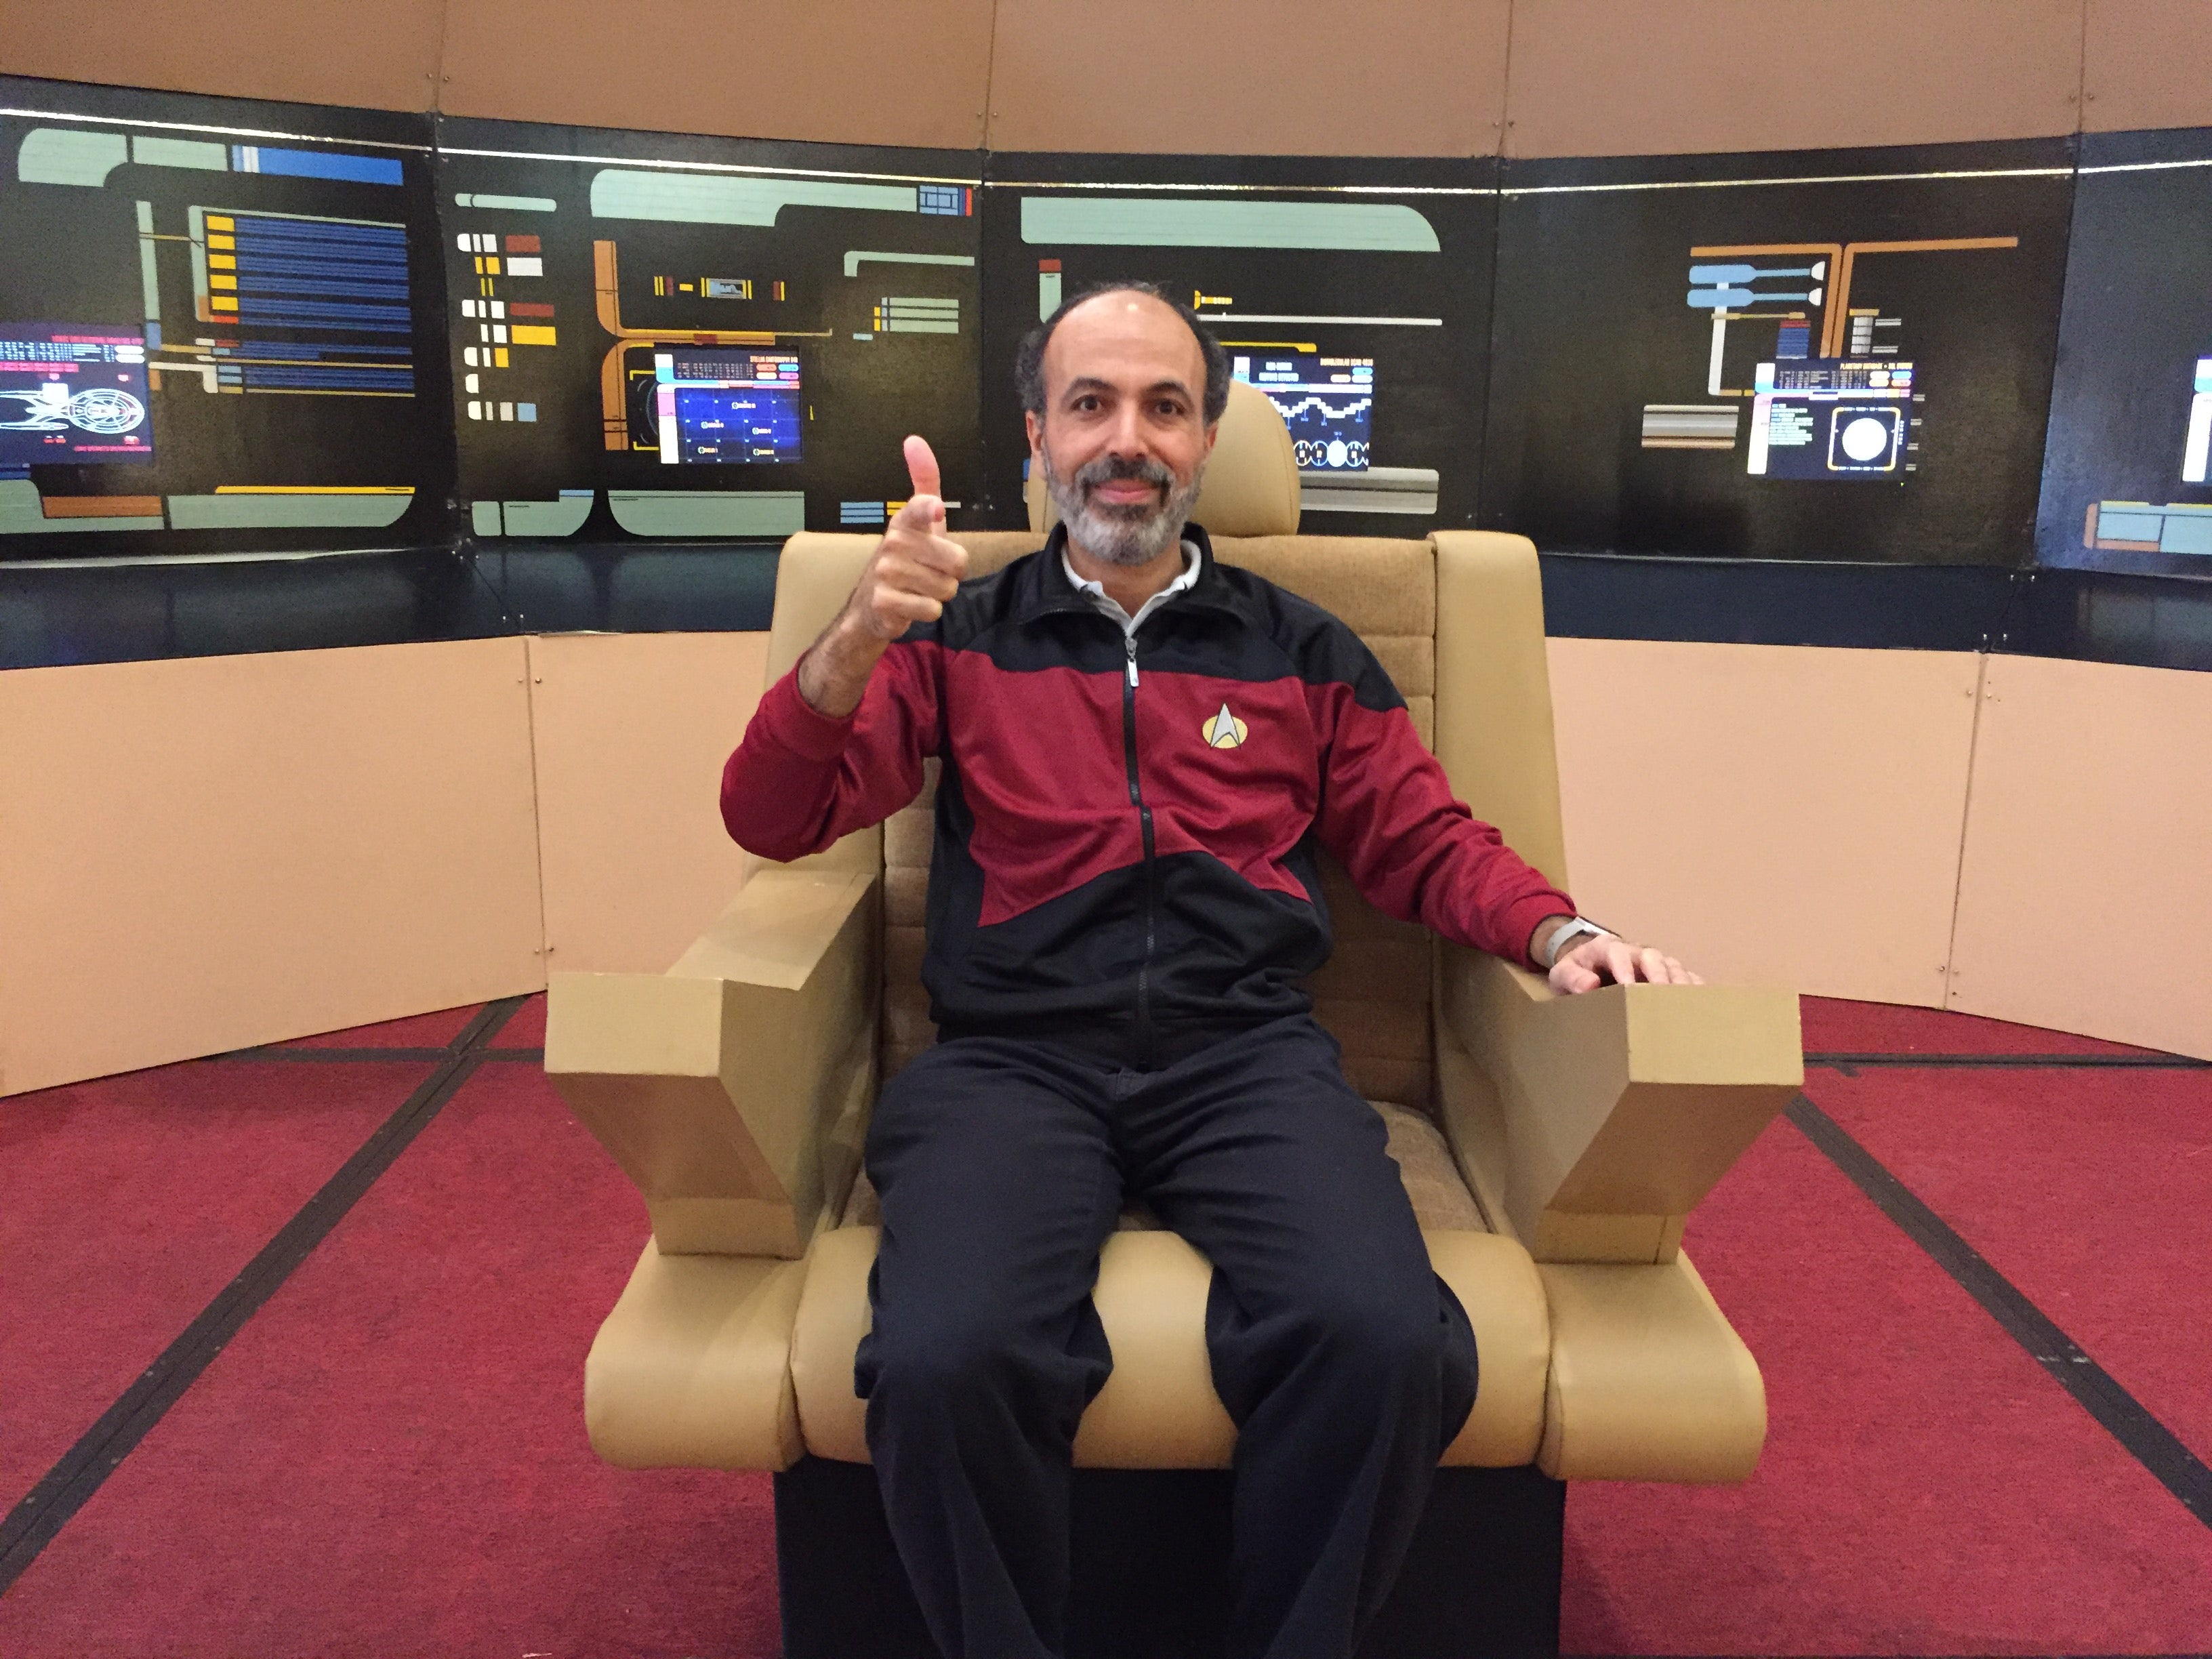 Dr Mohamed Noor on the Enterprise bridge